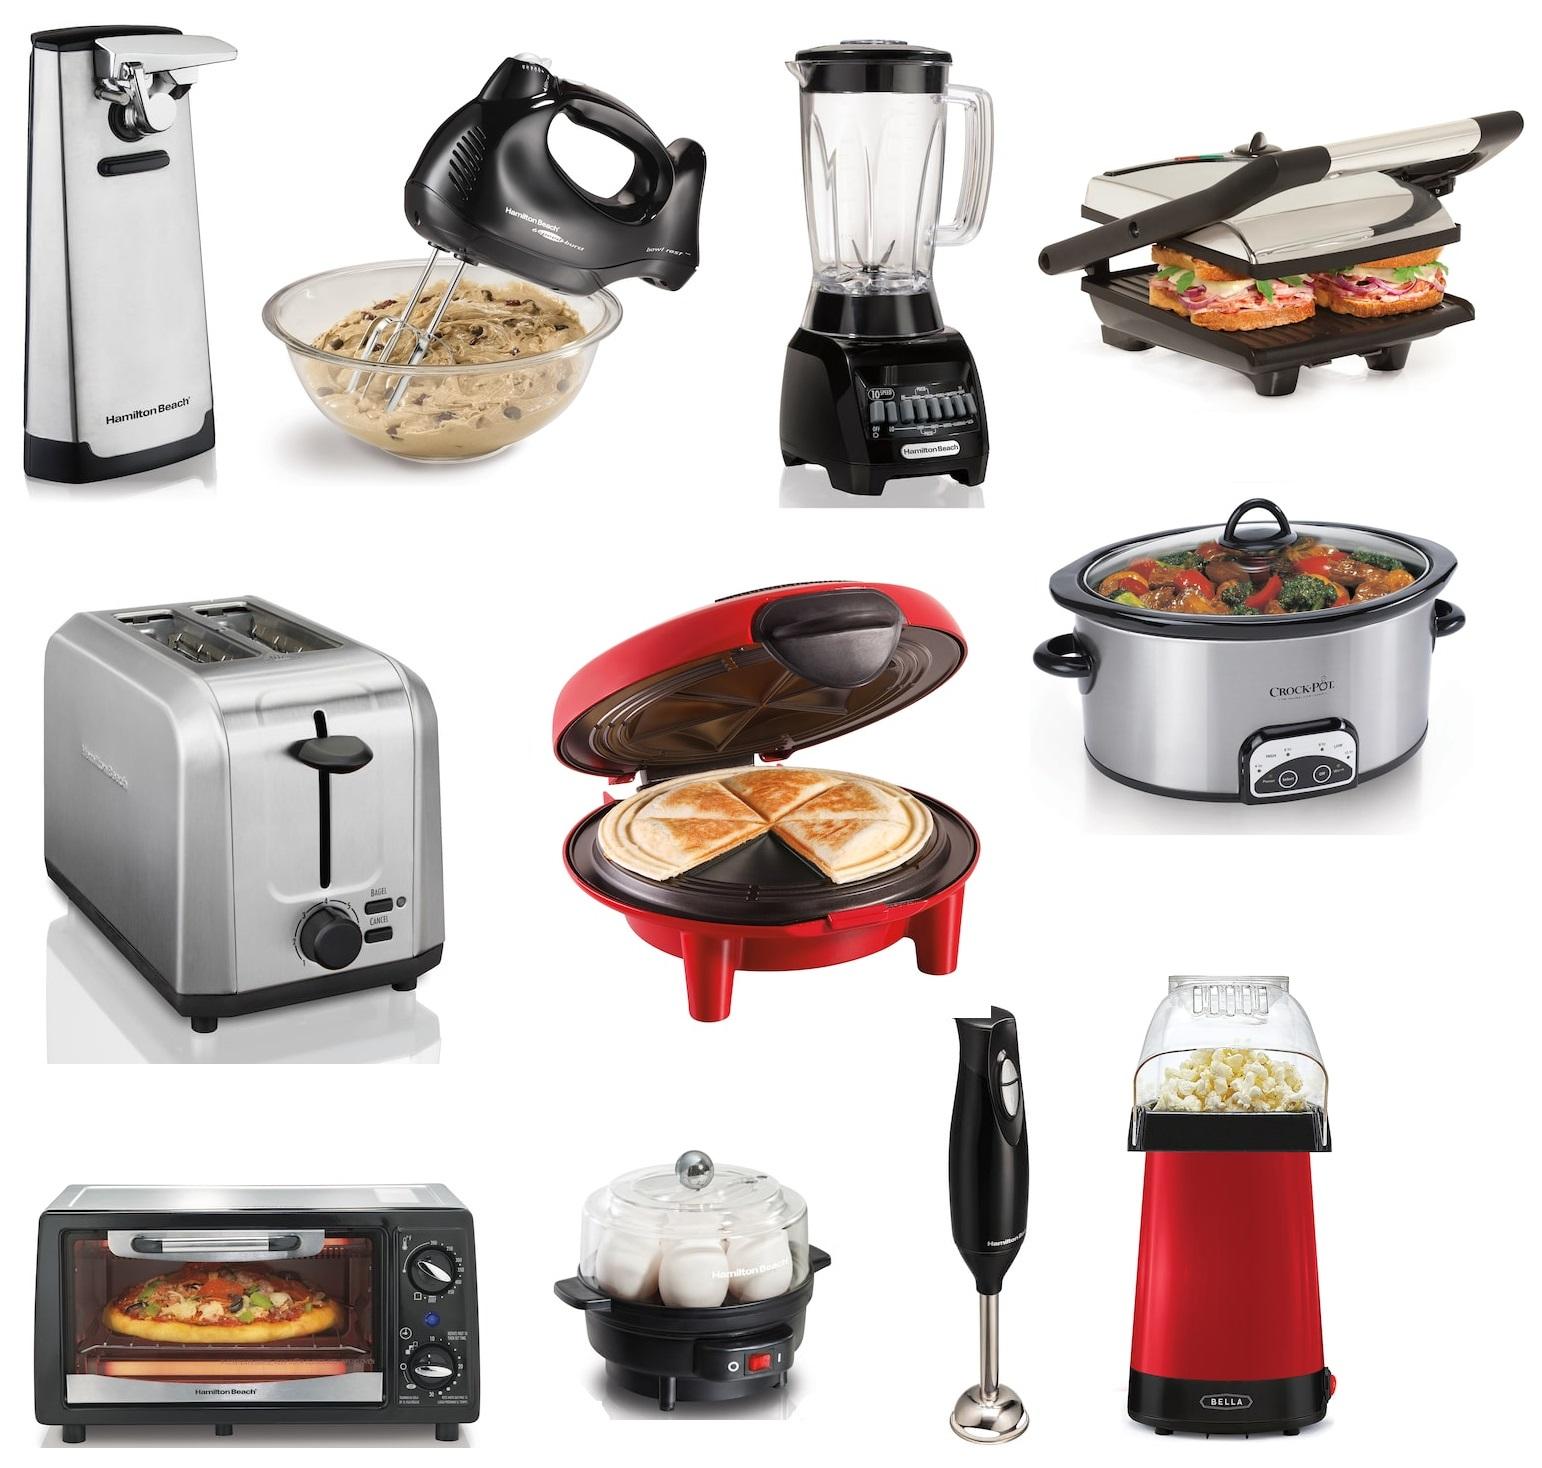 HOT – Kohls: 3 Small Kitchen Appliances (Blender, Toaster Oven